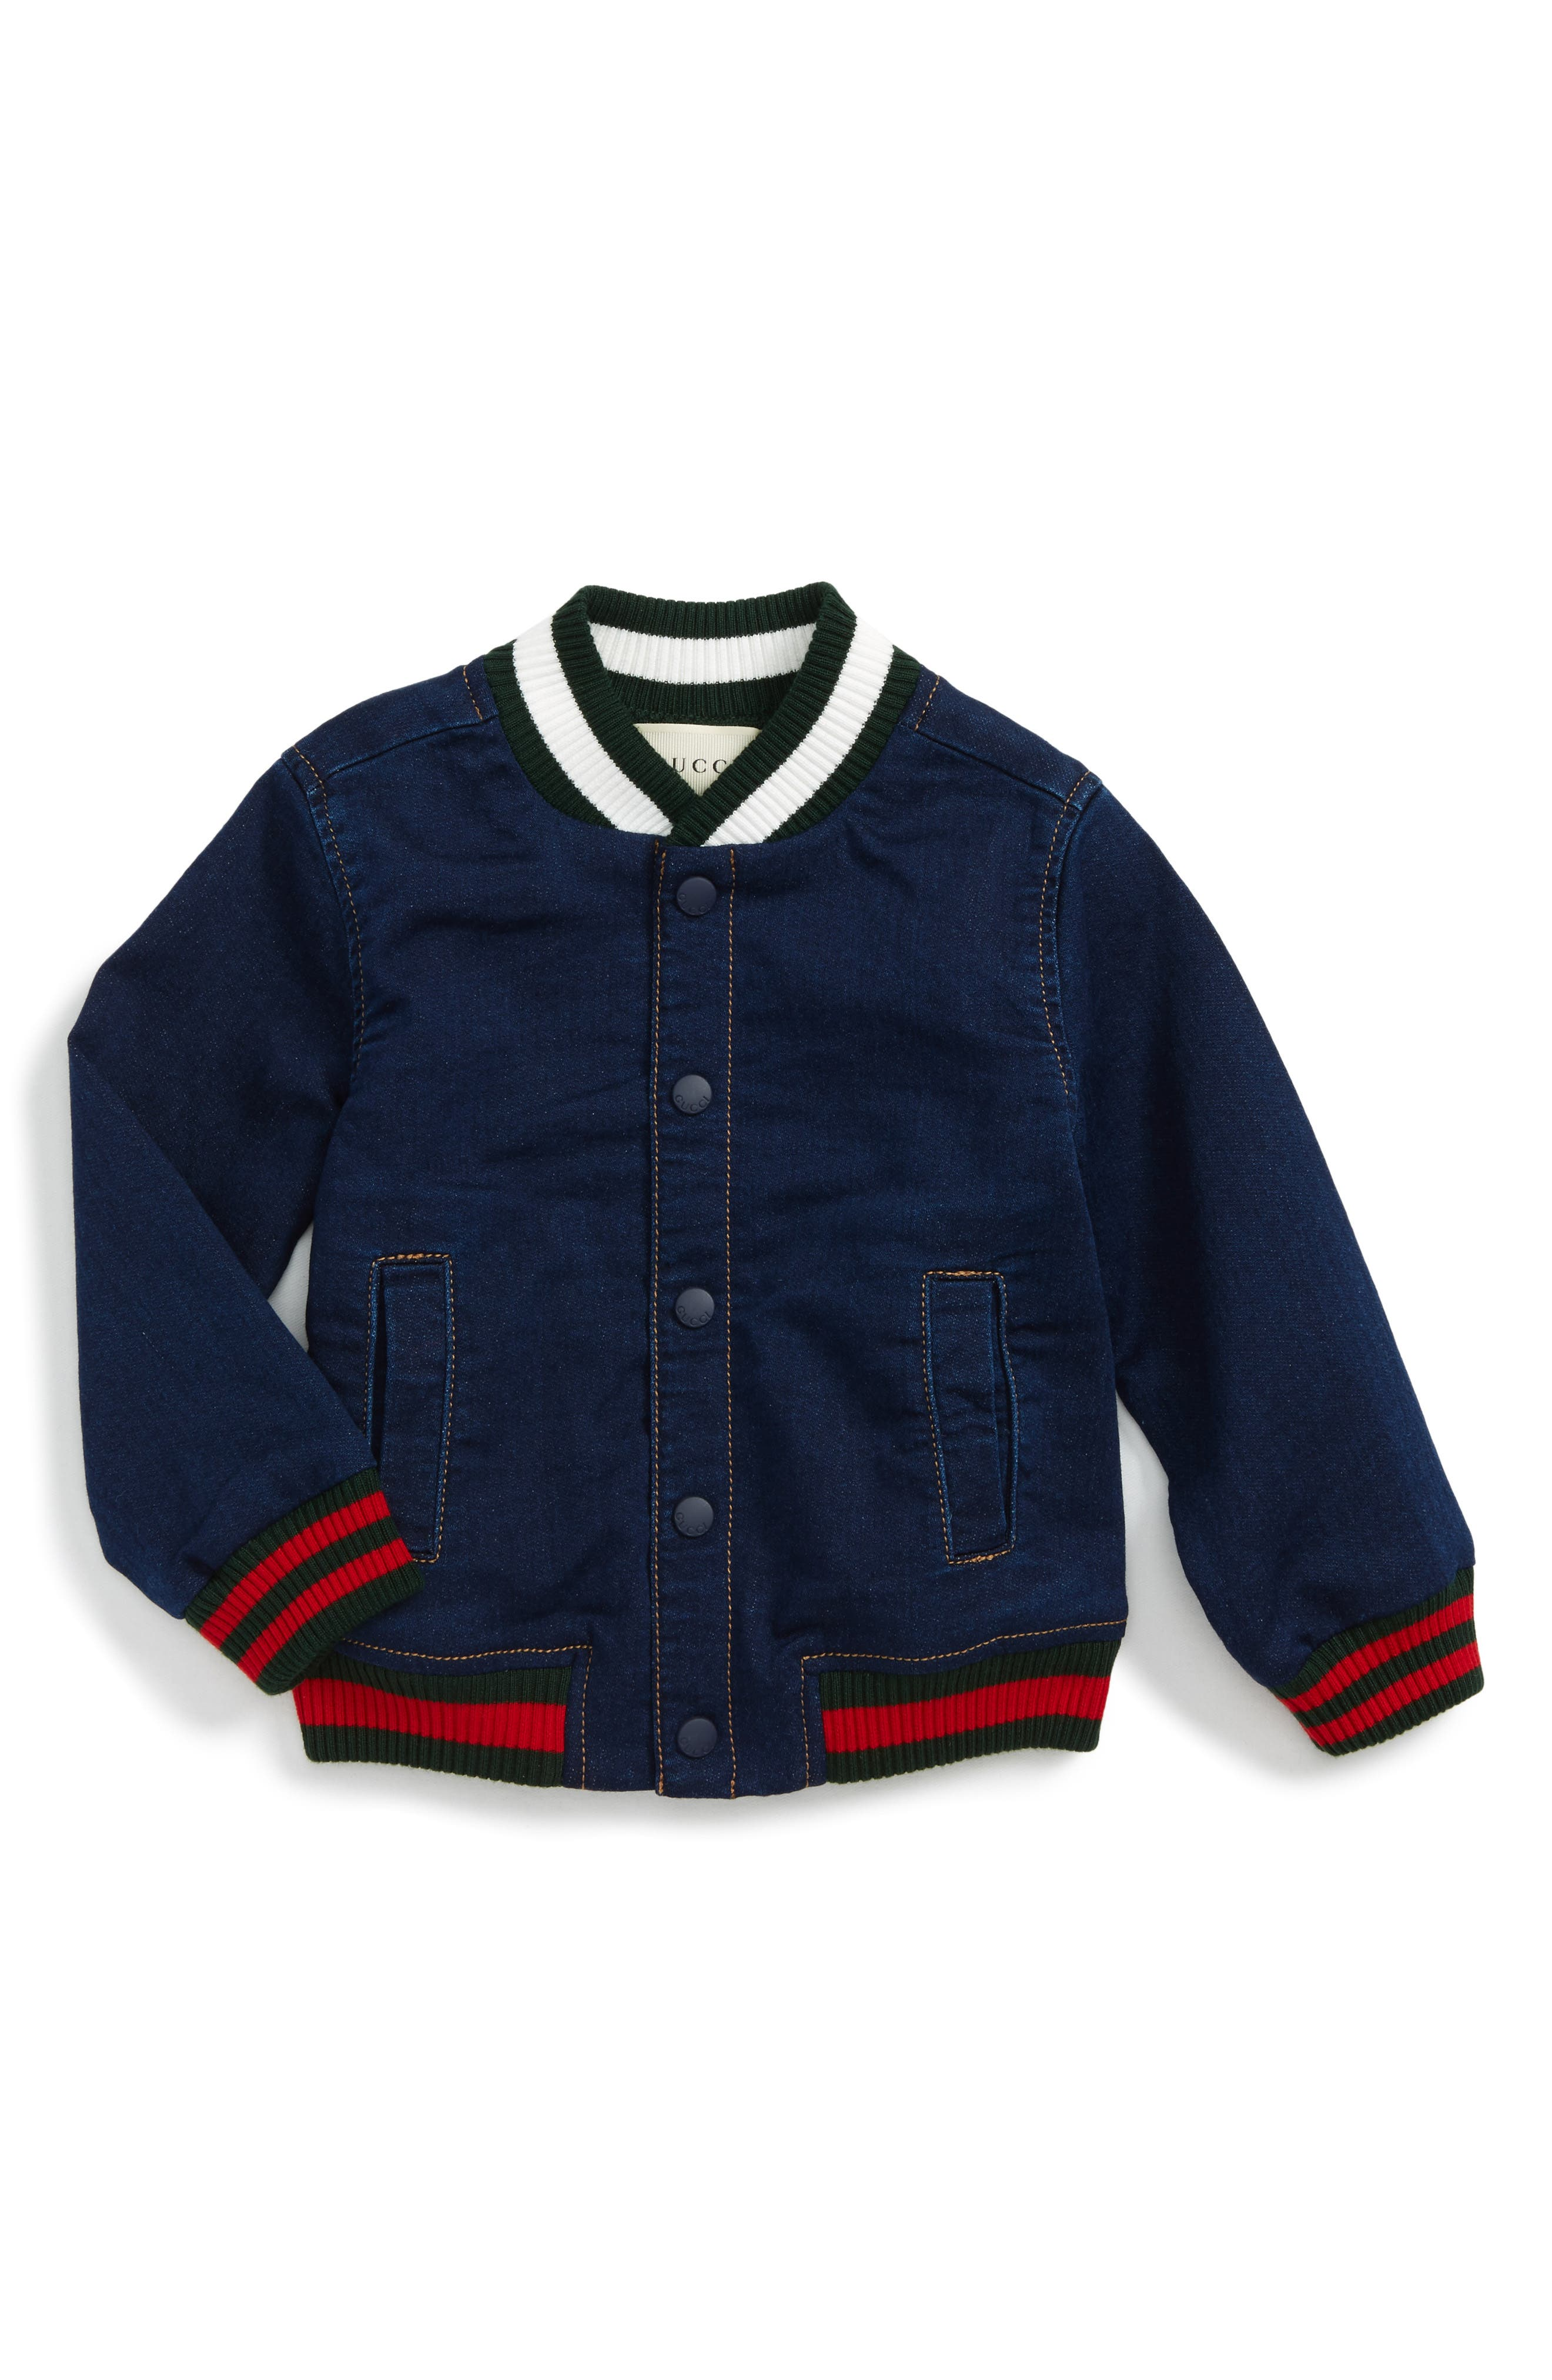 Gucci Chambray Bomber Jacket (Baby Boys)